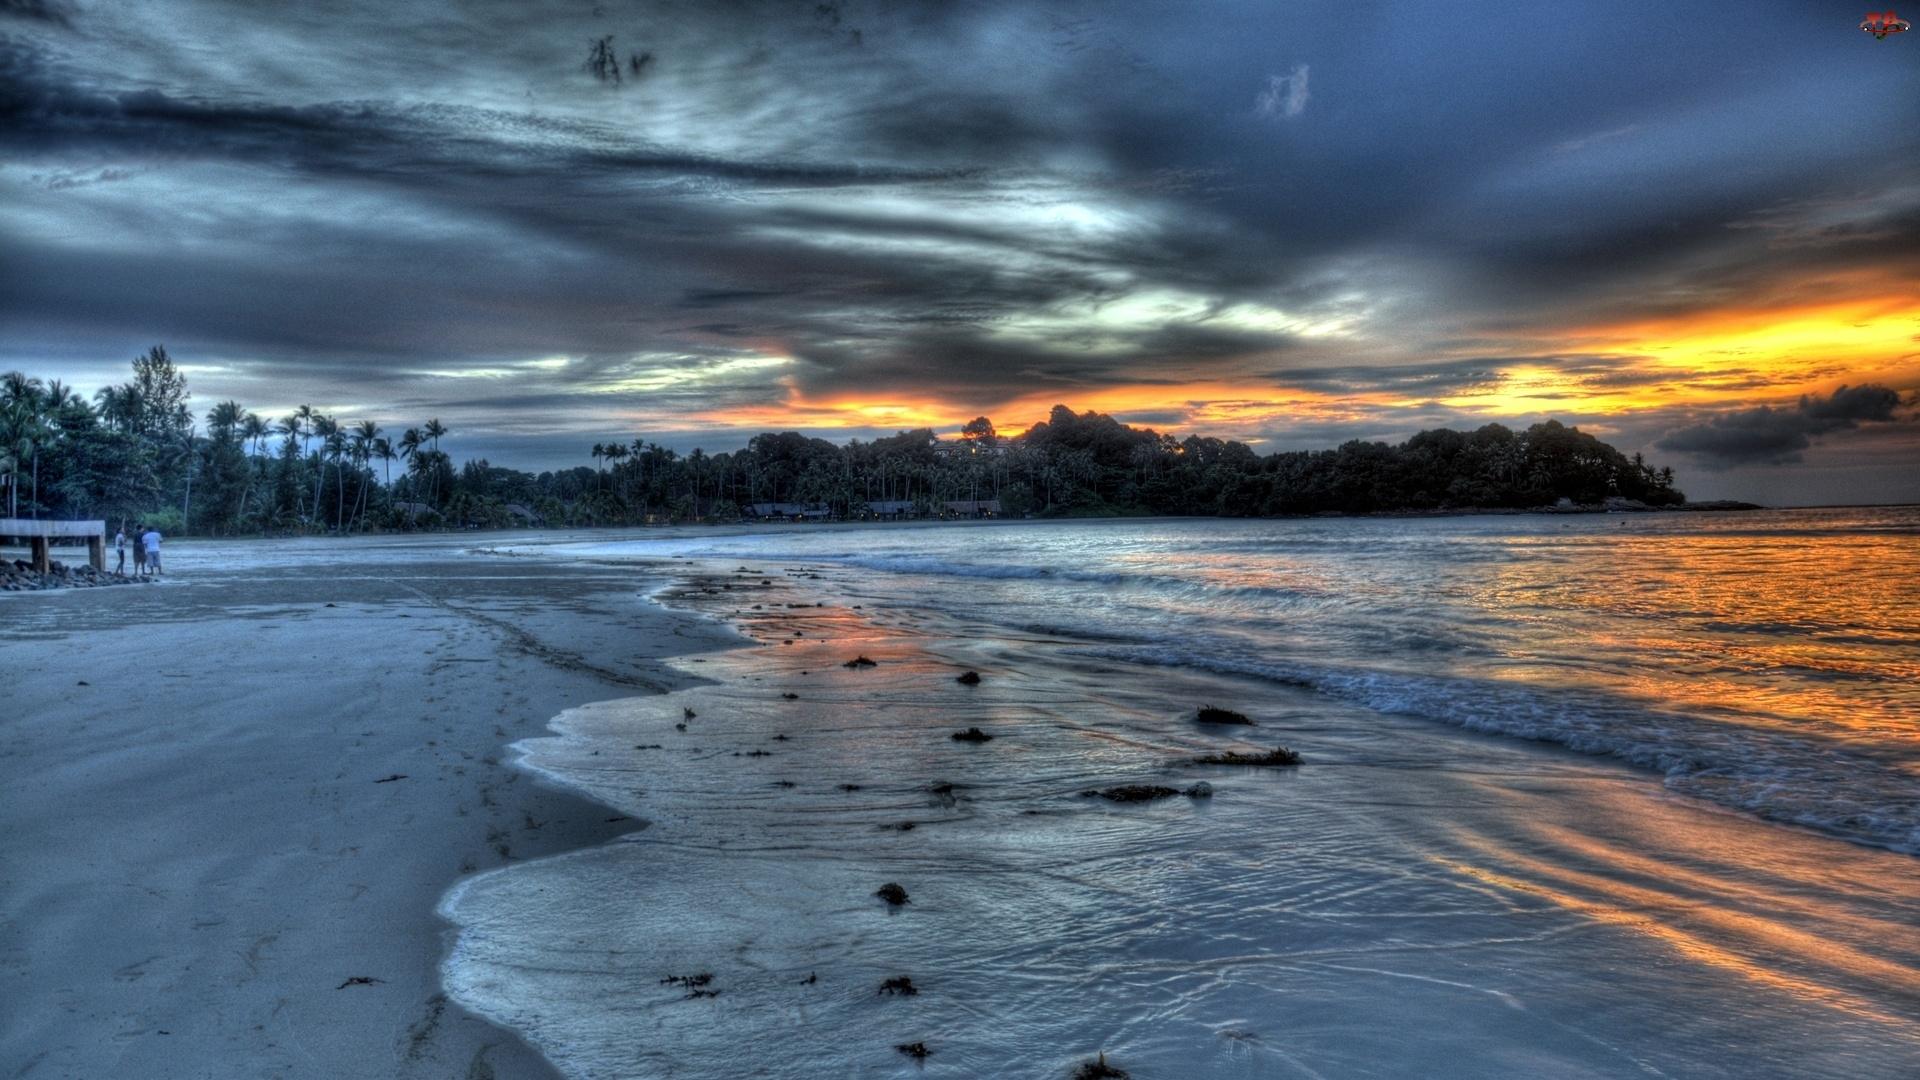 Plaża, Chmury, Morze, Ciemne